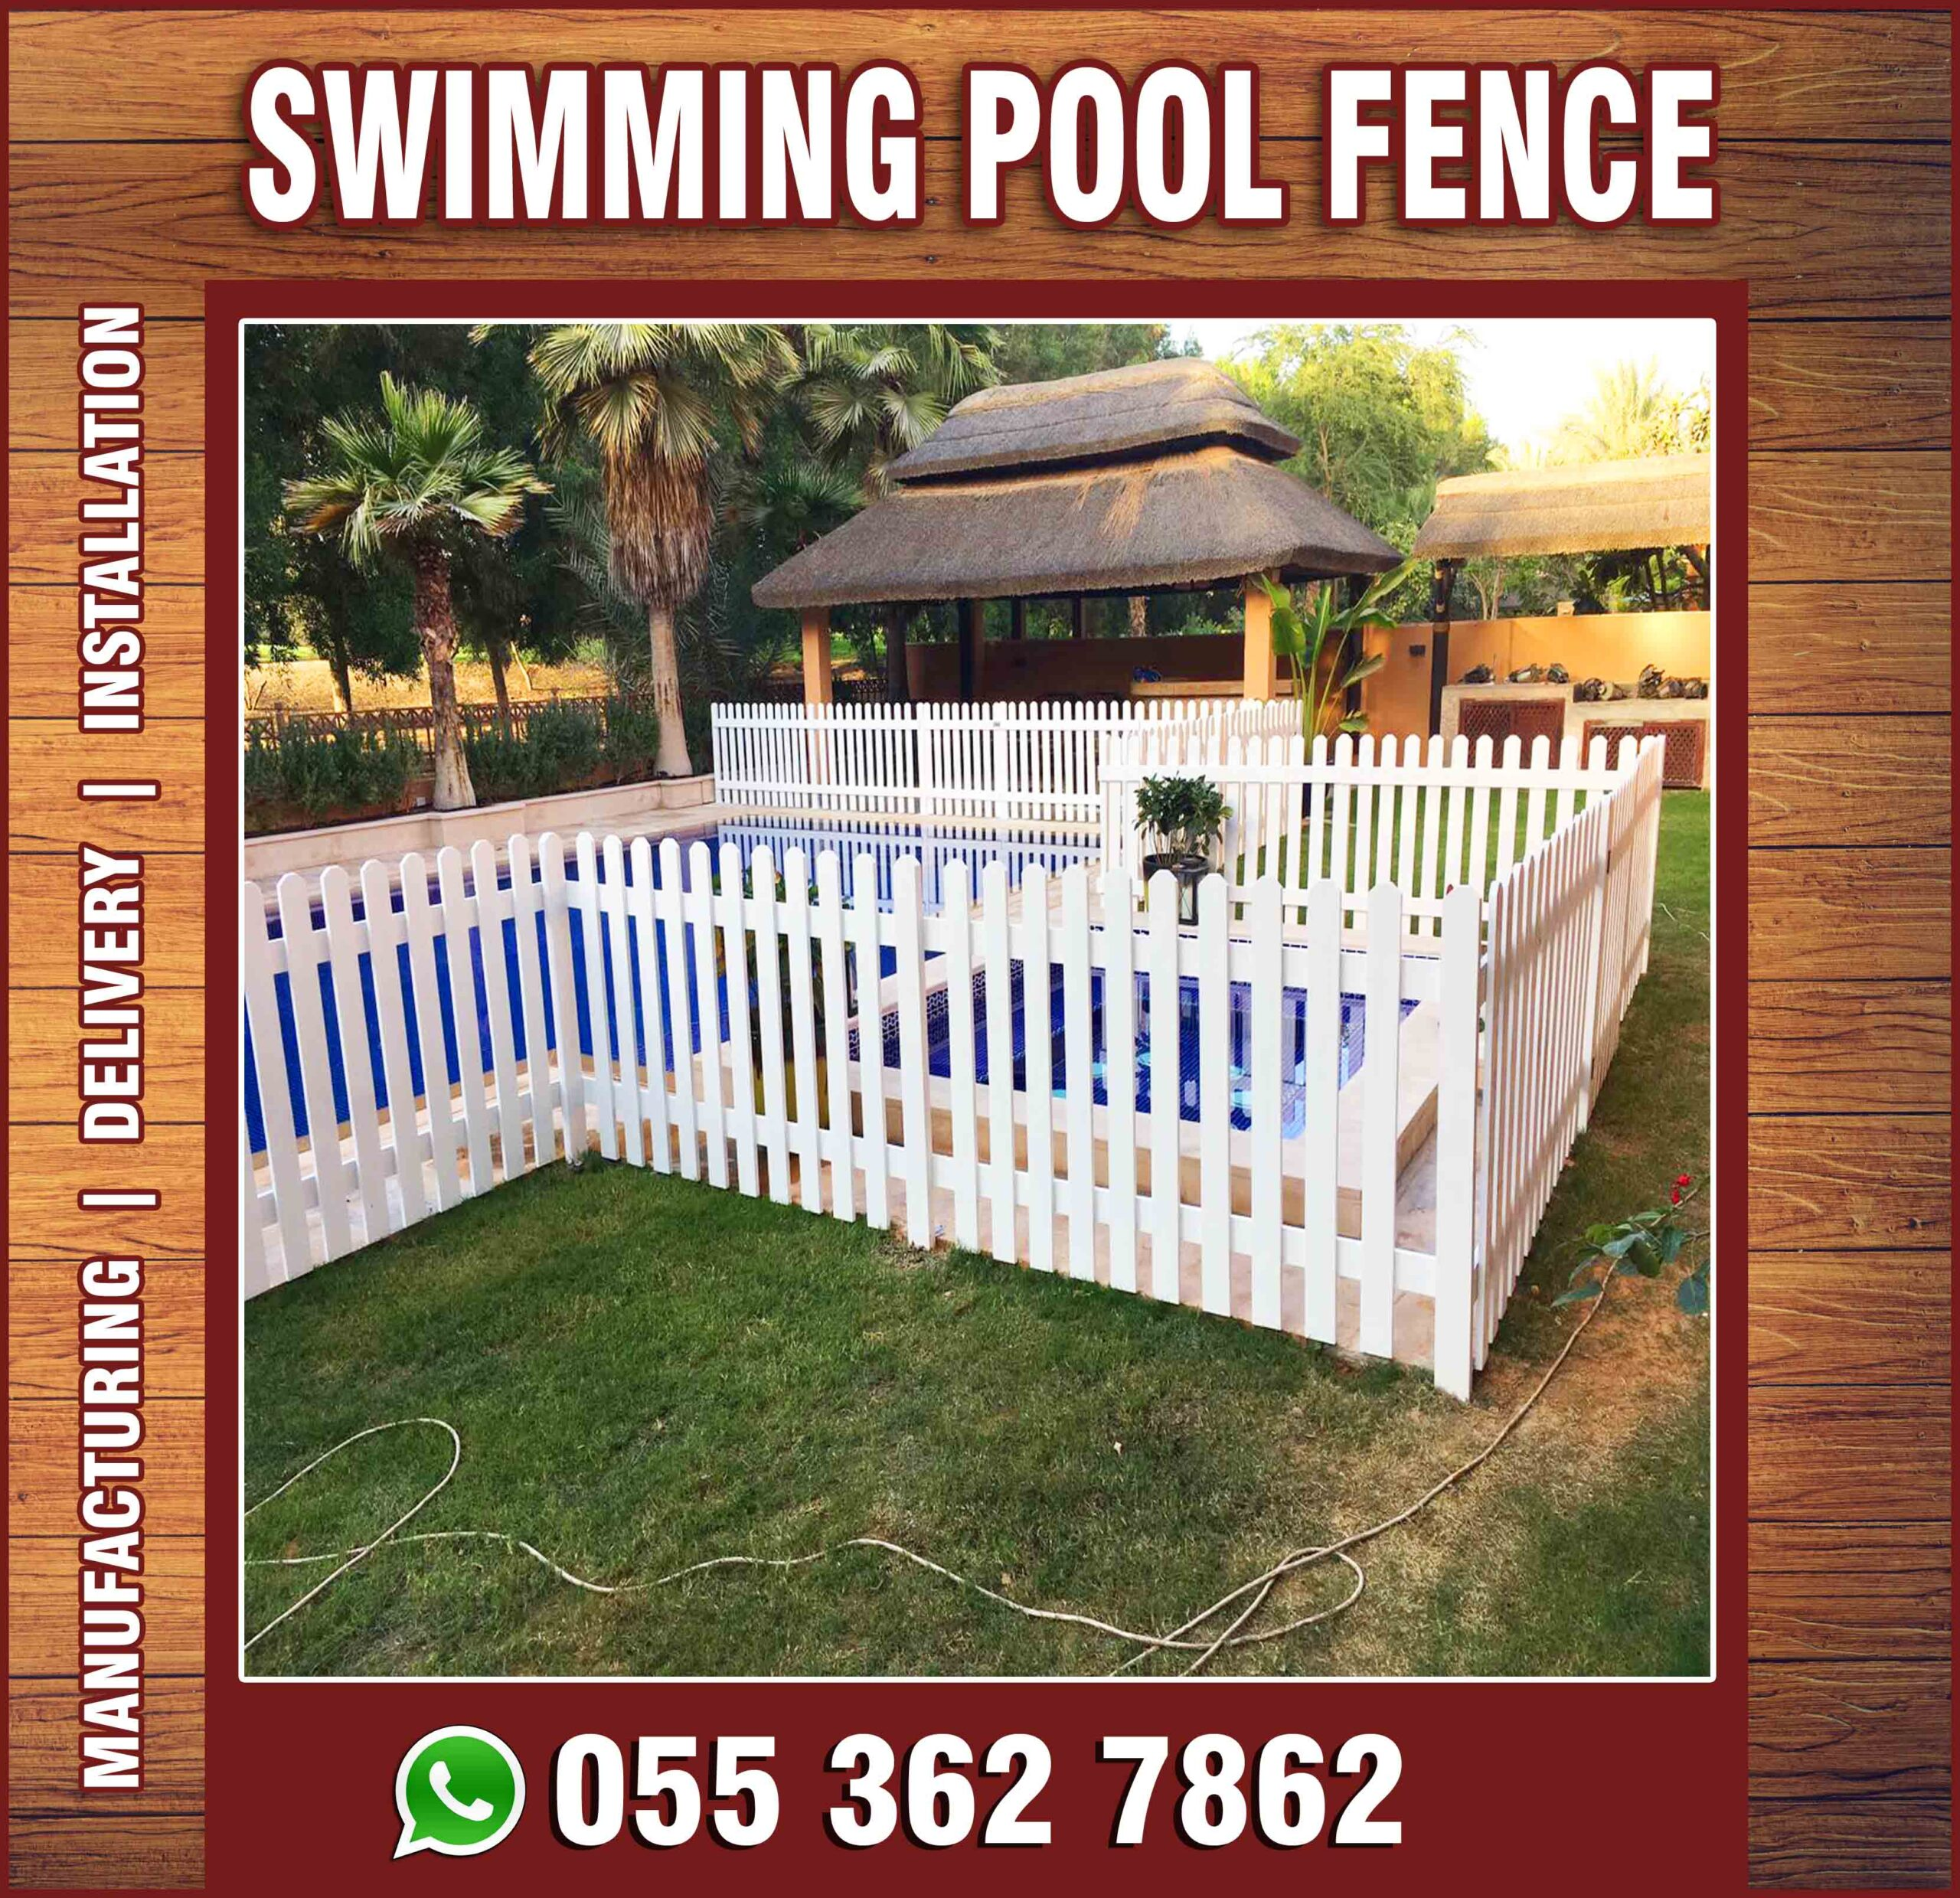 Swimming Pool Privacy Fences in UAE.jpg